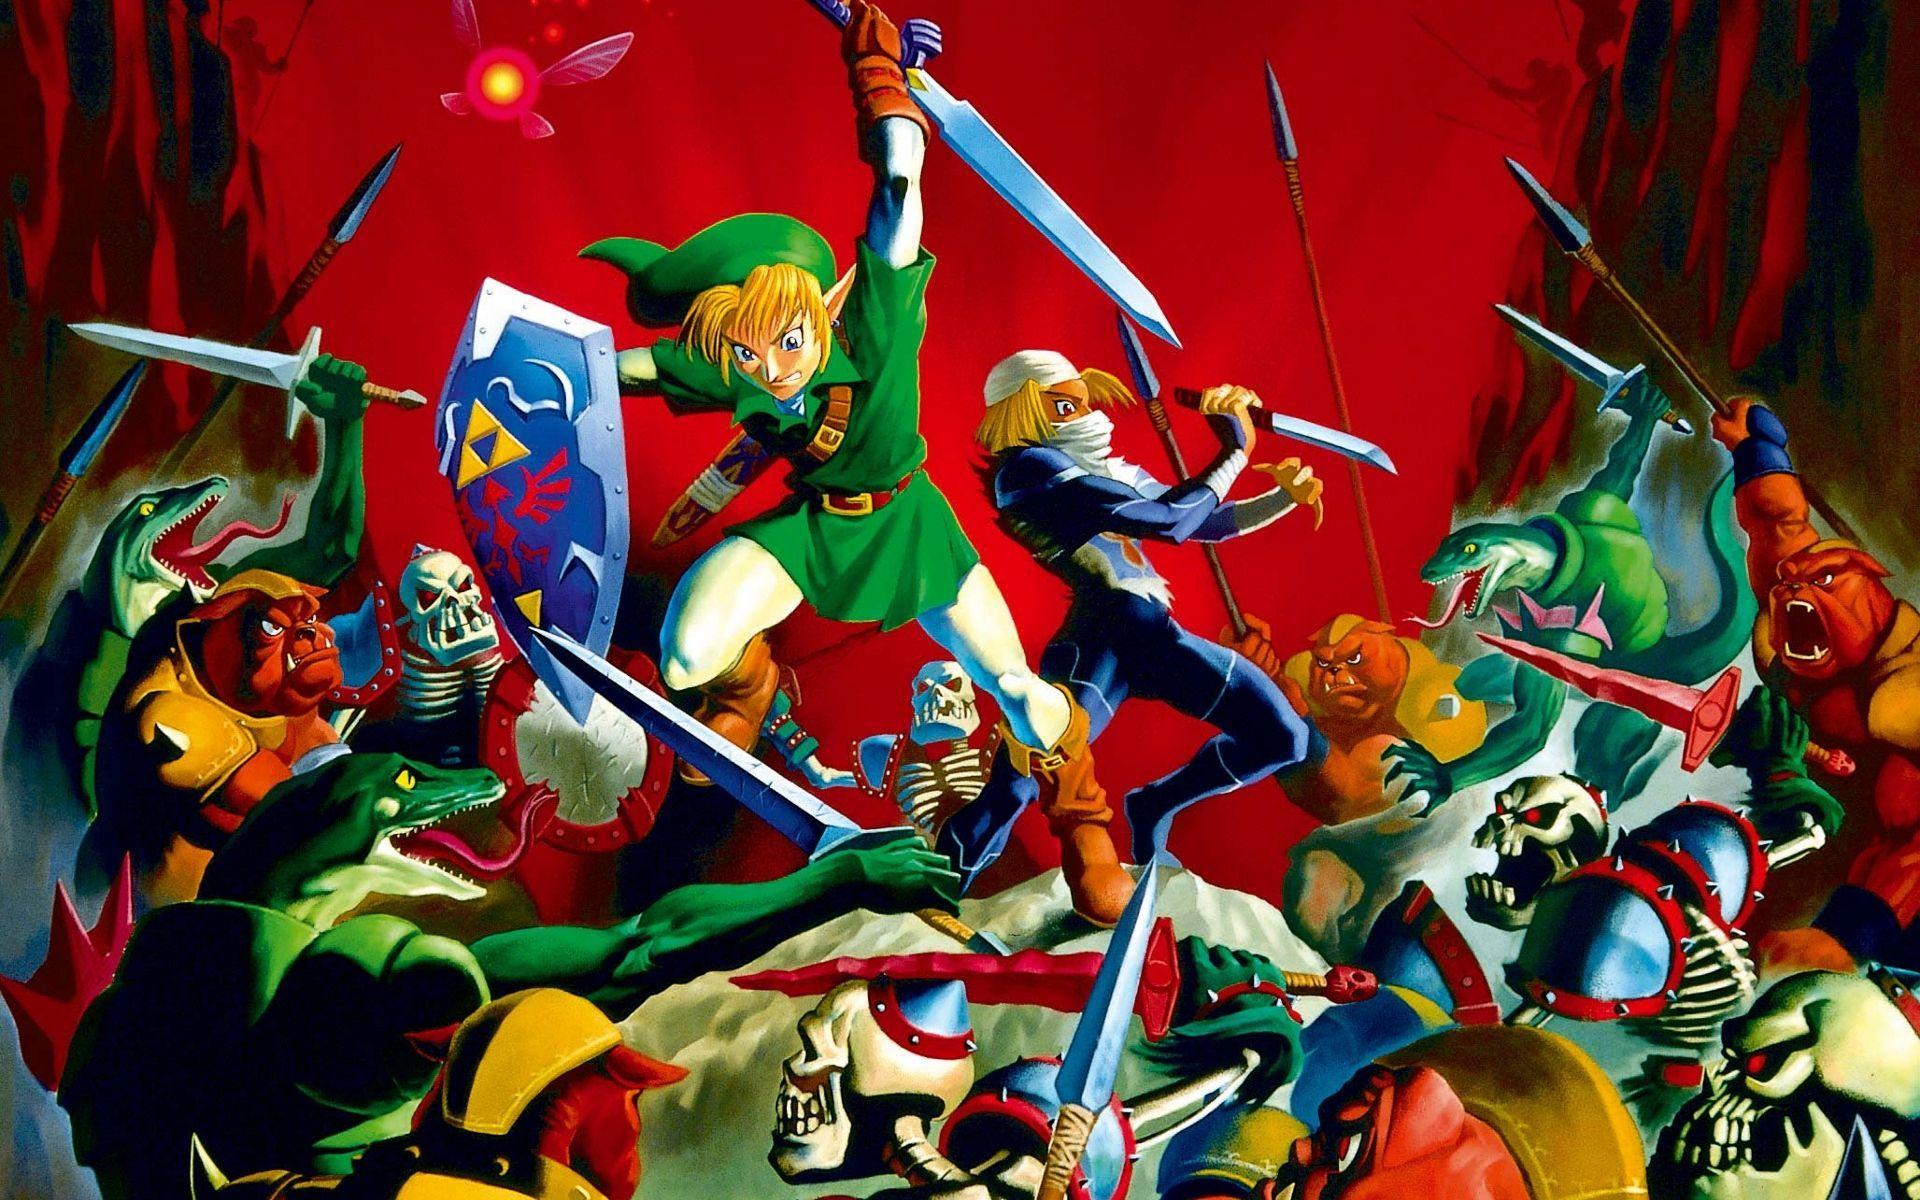 Zelda iphone wallpaper tumblr - The Legend Of Zelda Ocarina Of Time Images Cool Loz Wallpaper Hd